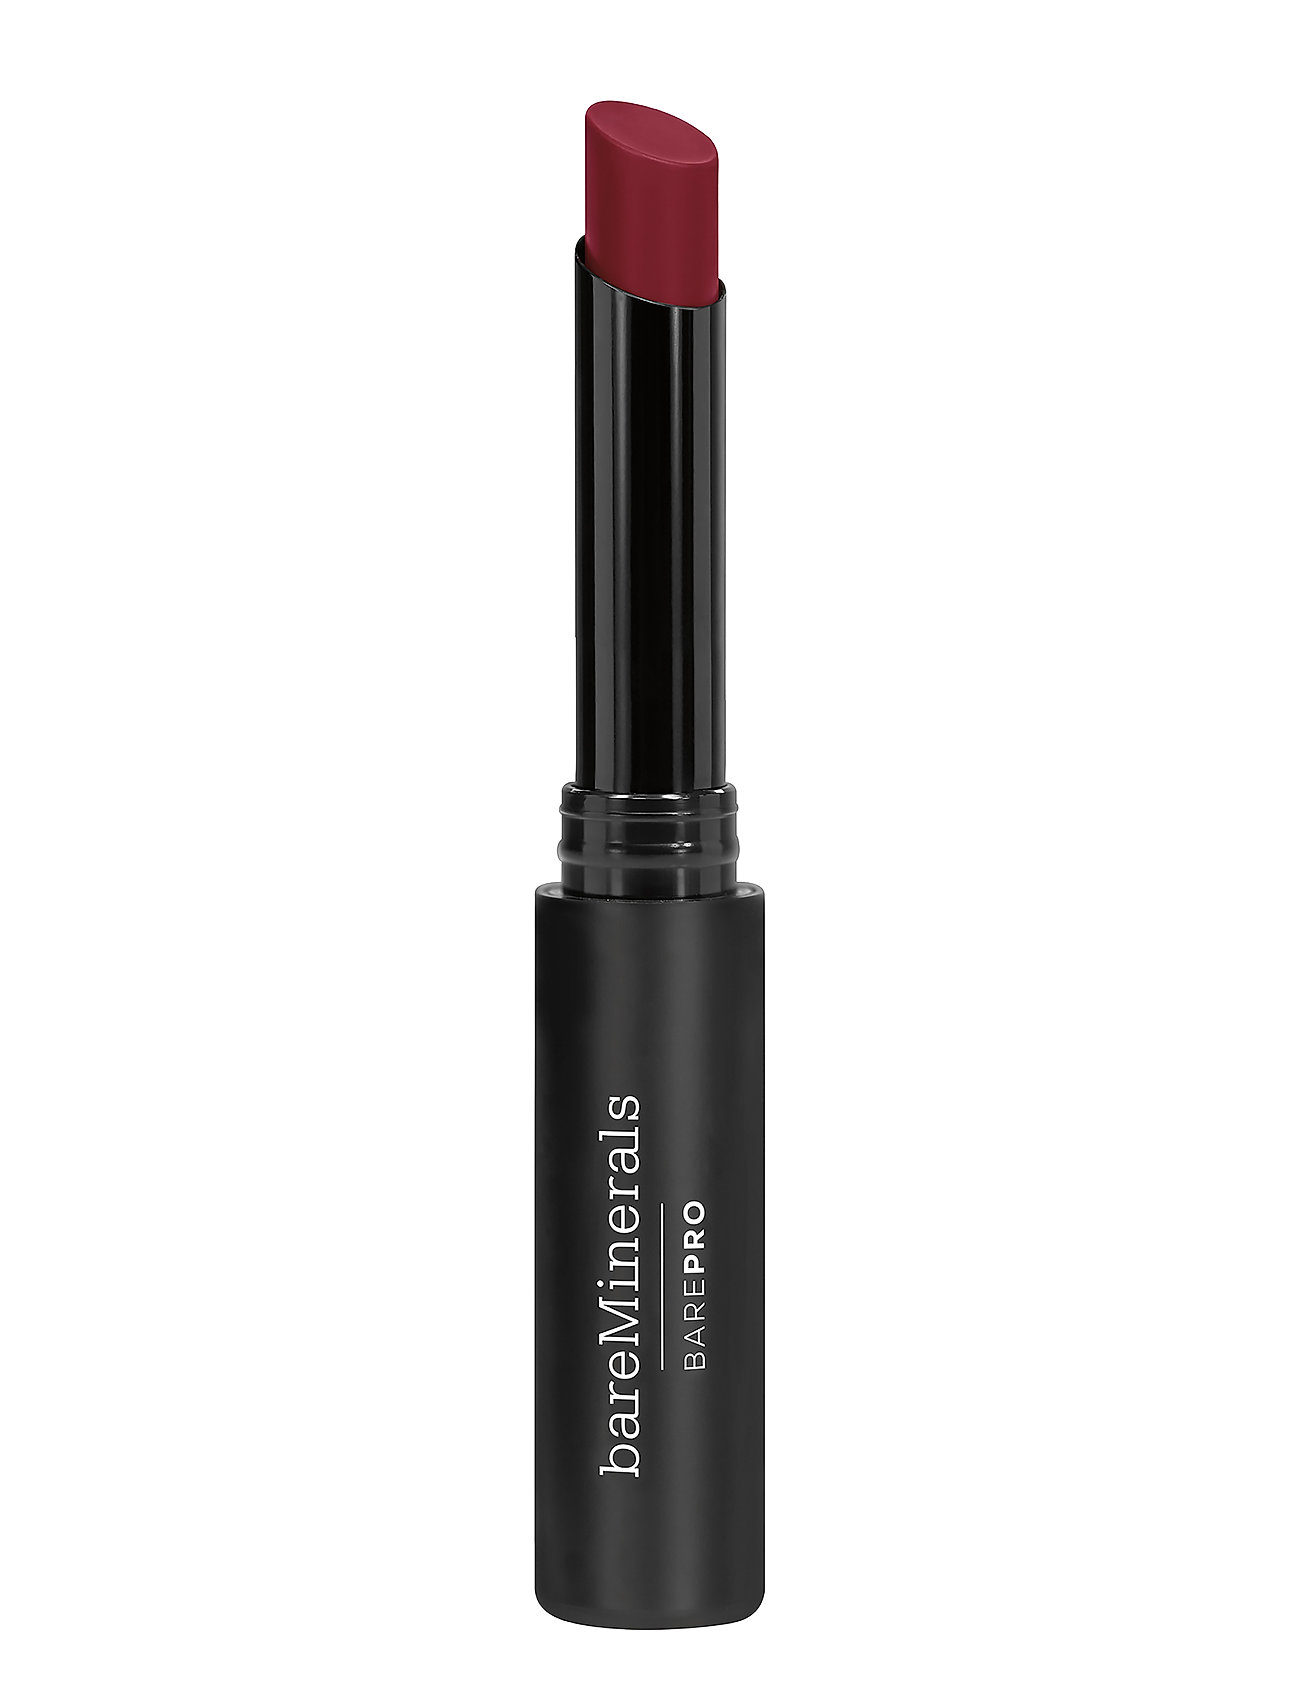 Image of Barepro Longwear Lipstick Raspberry Læbestift Makeup Rød BareMinerals (3138616967)